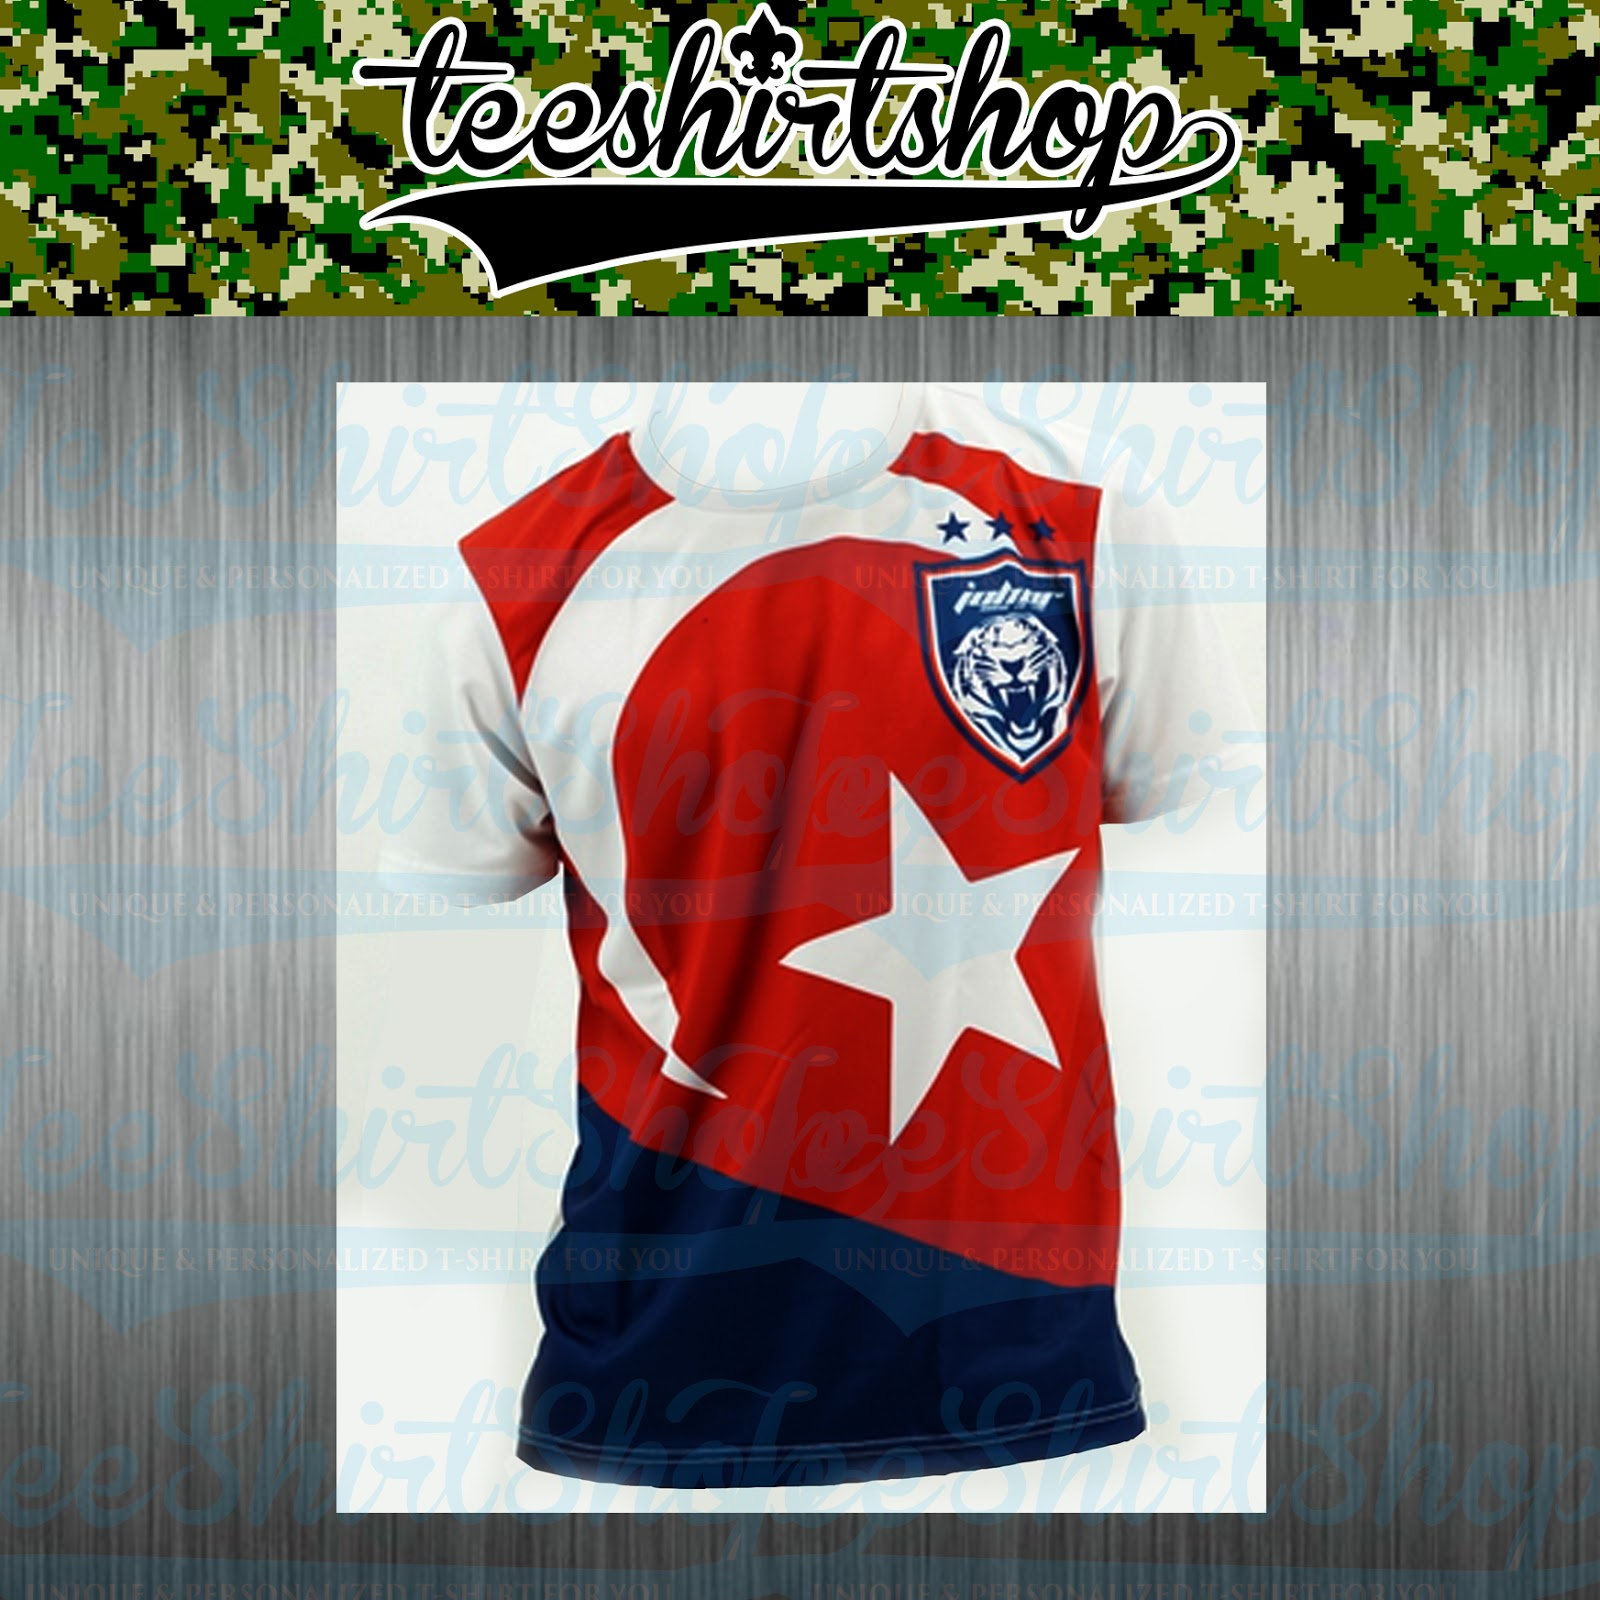 Design t shirt johor - Design T Shirt Johor Jdt Anak Johor